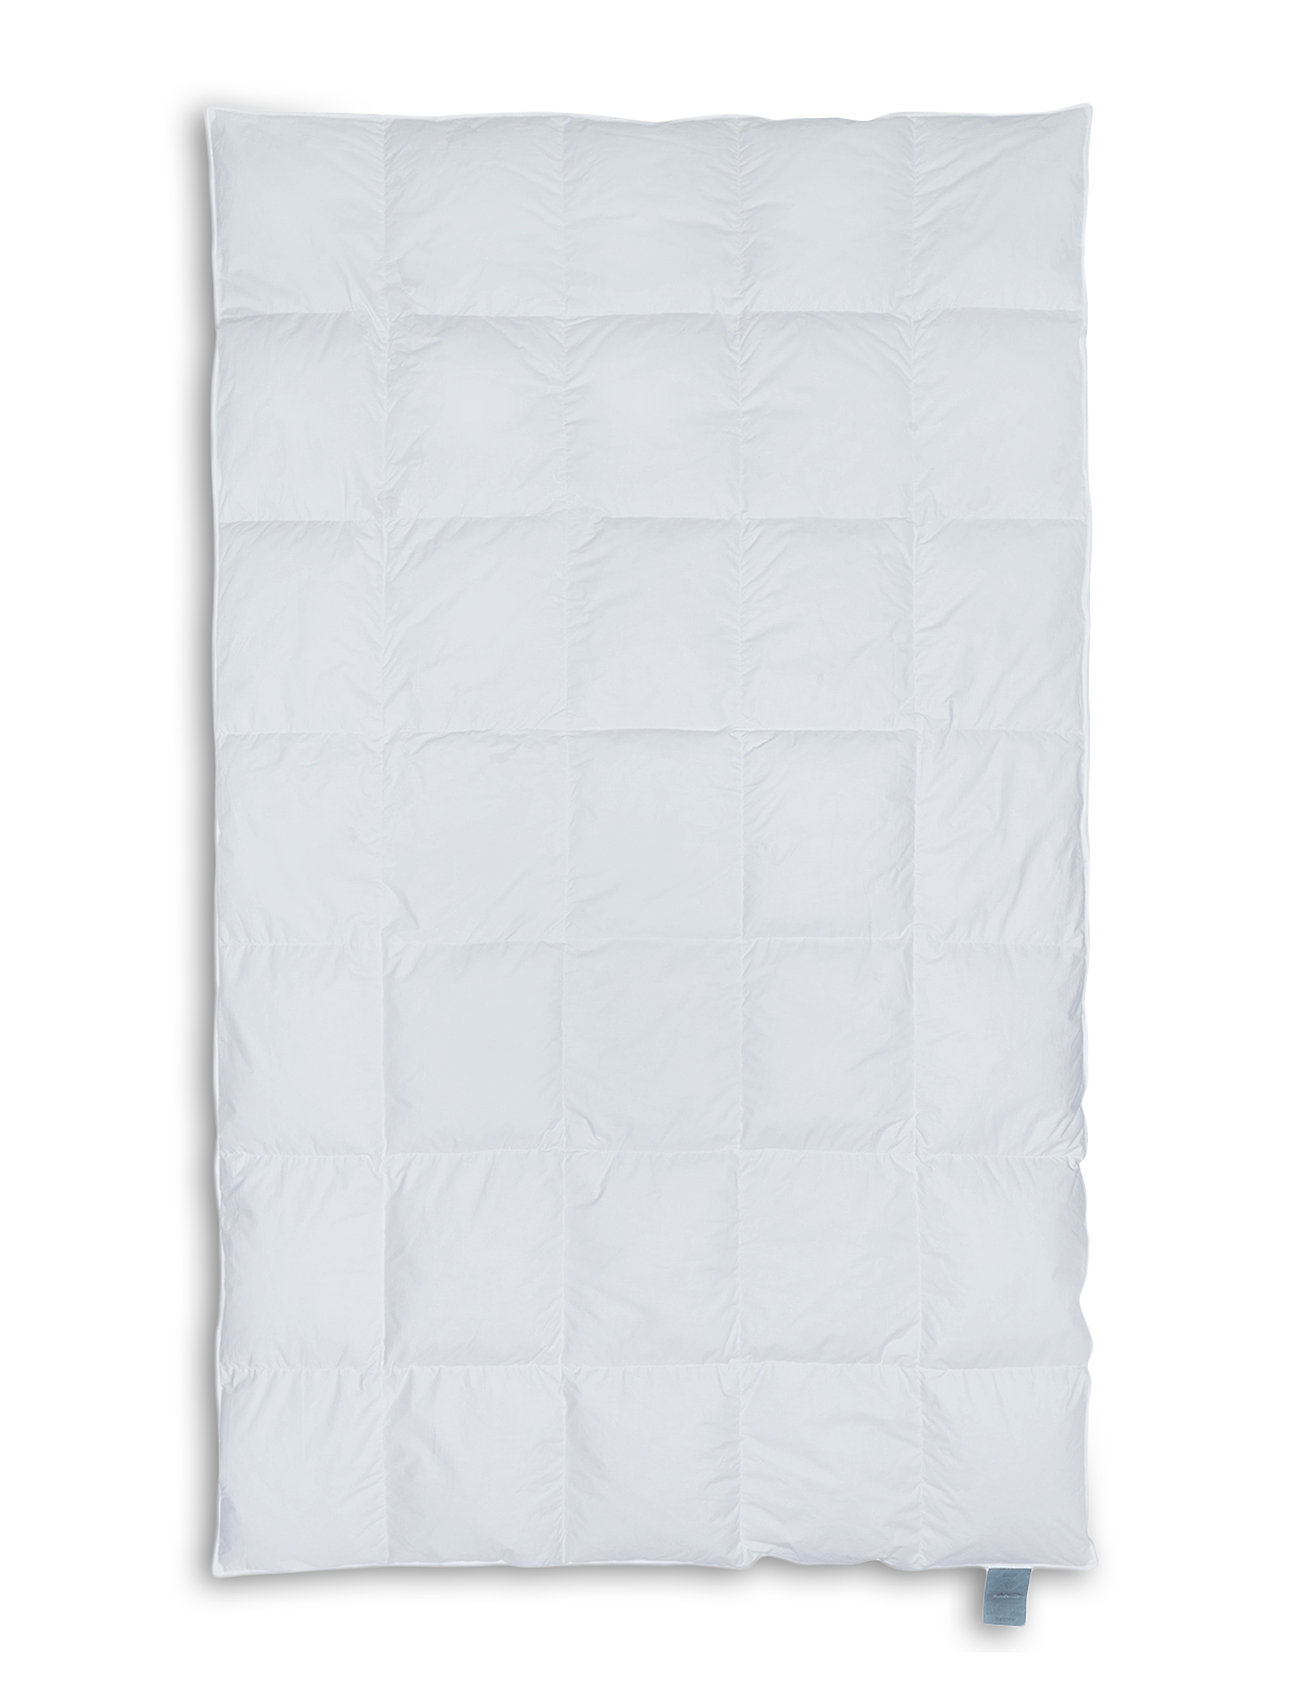 Quilts of Denmark - DanaDream Fiber Class Ex light - white - 1